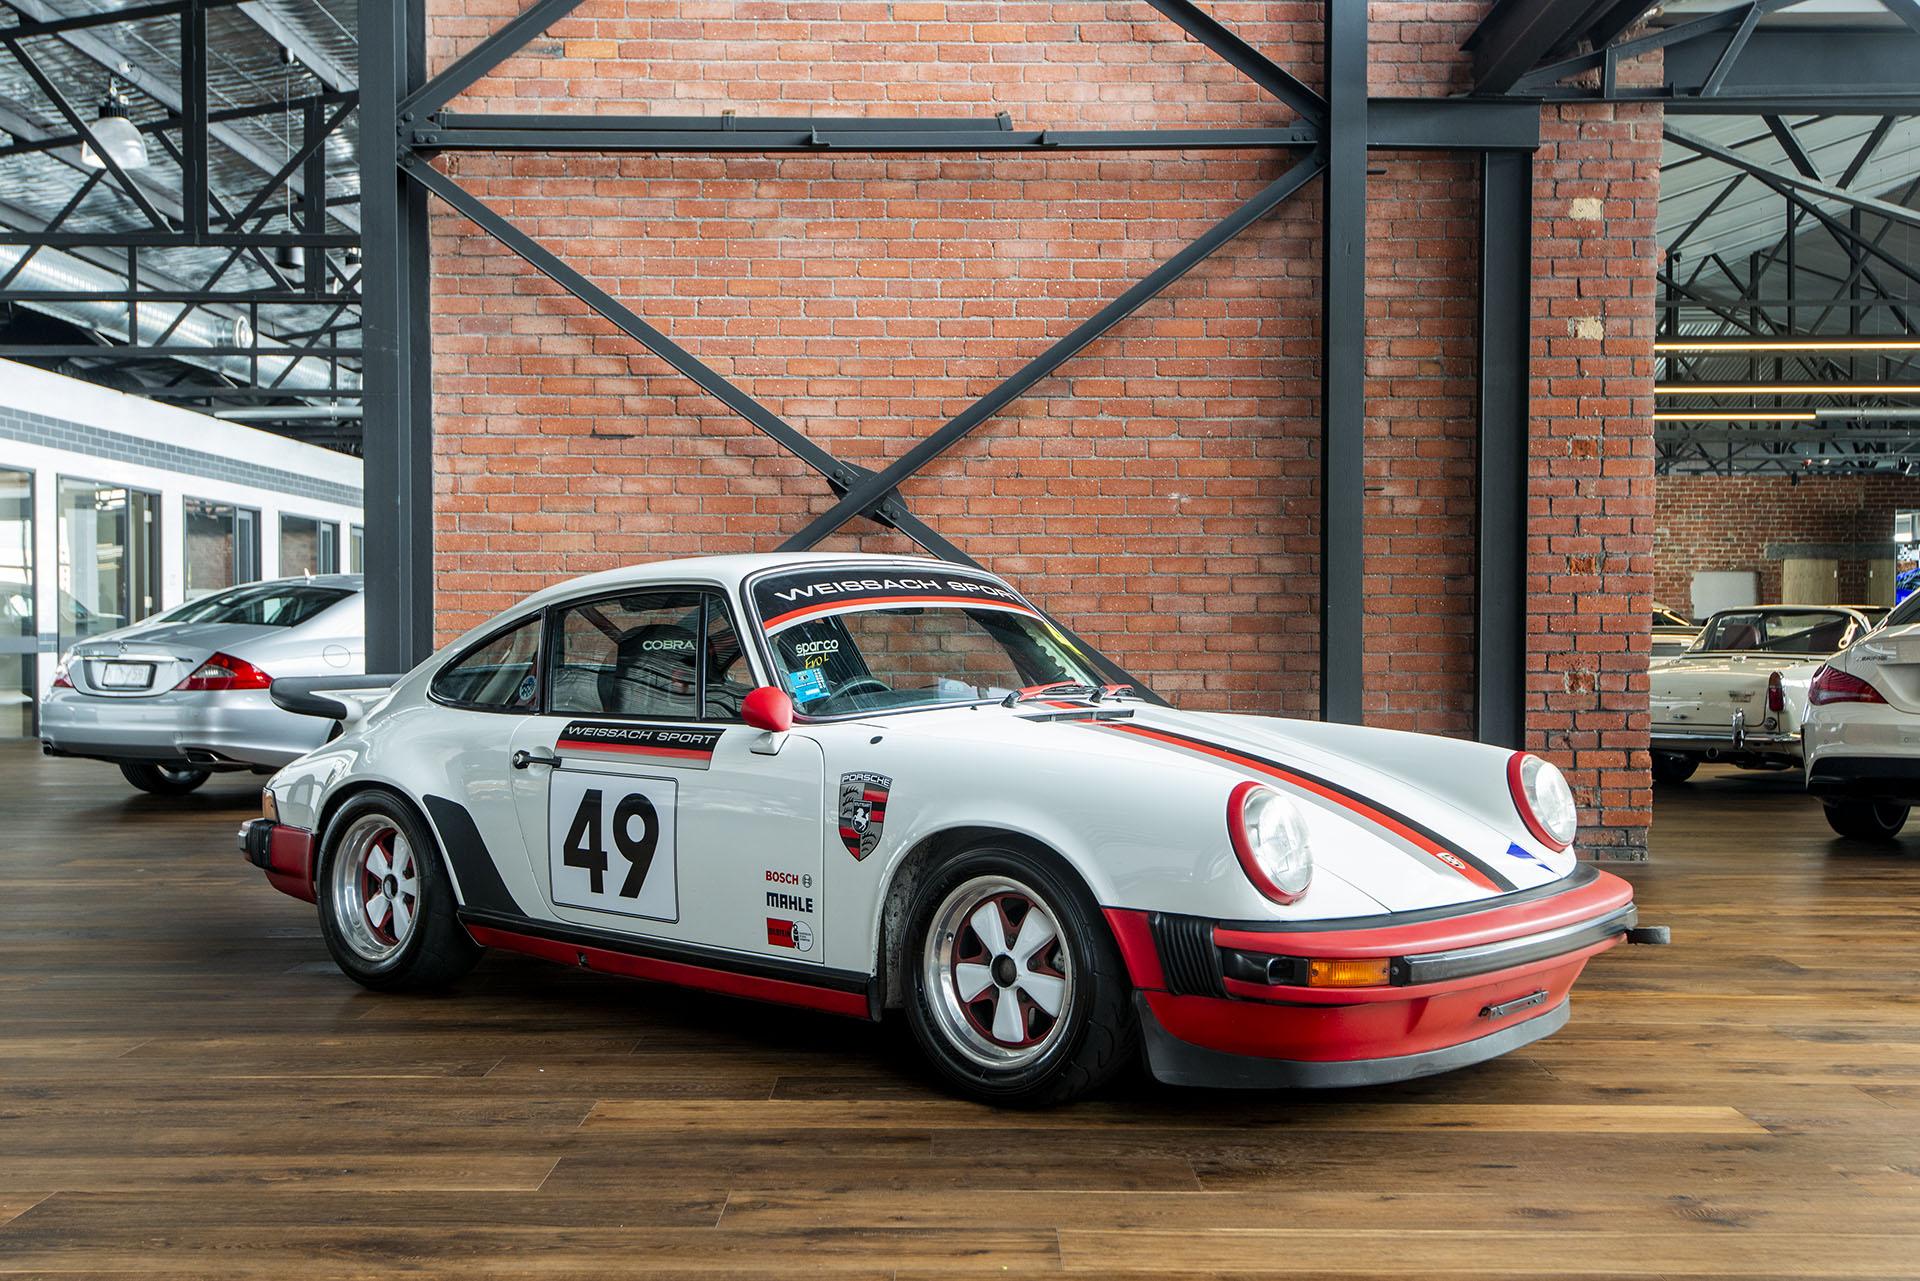 Porsche 911 For Sale >> 1979 Porsche 911 SC - Richmonds - Classic and Prestige ...